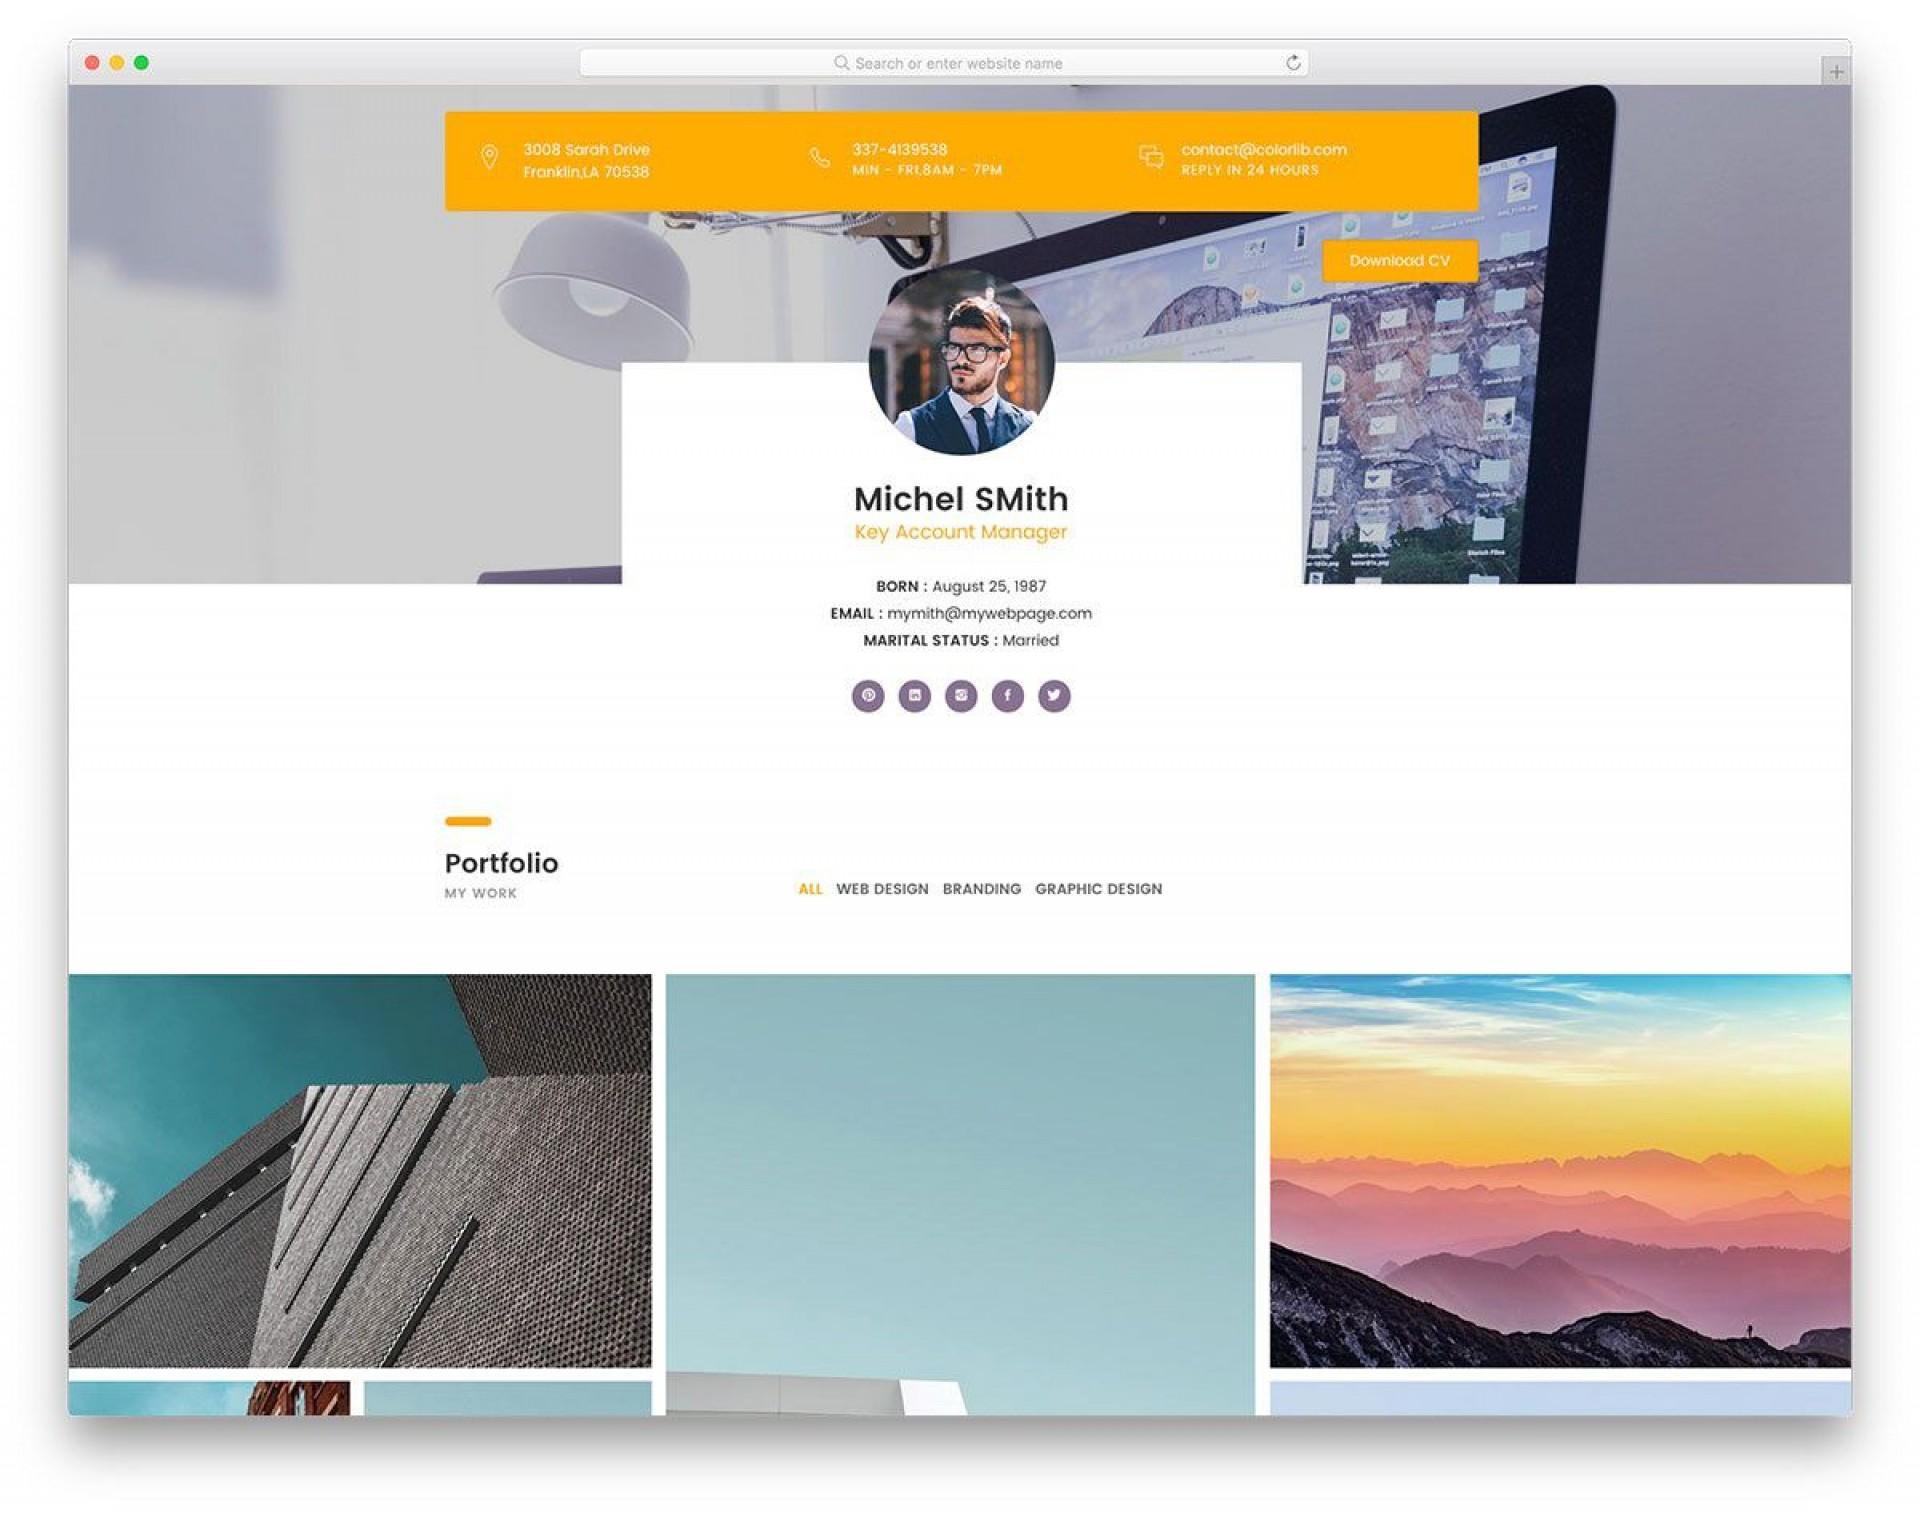 002 Frightening Website Design Template Free Inspiration  Asp.net Web Download Psd1920